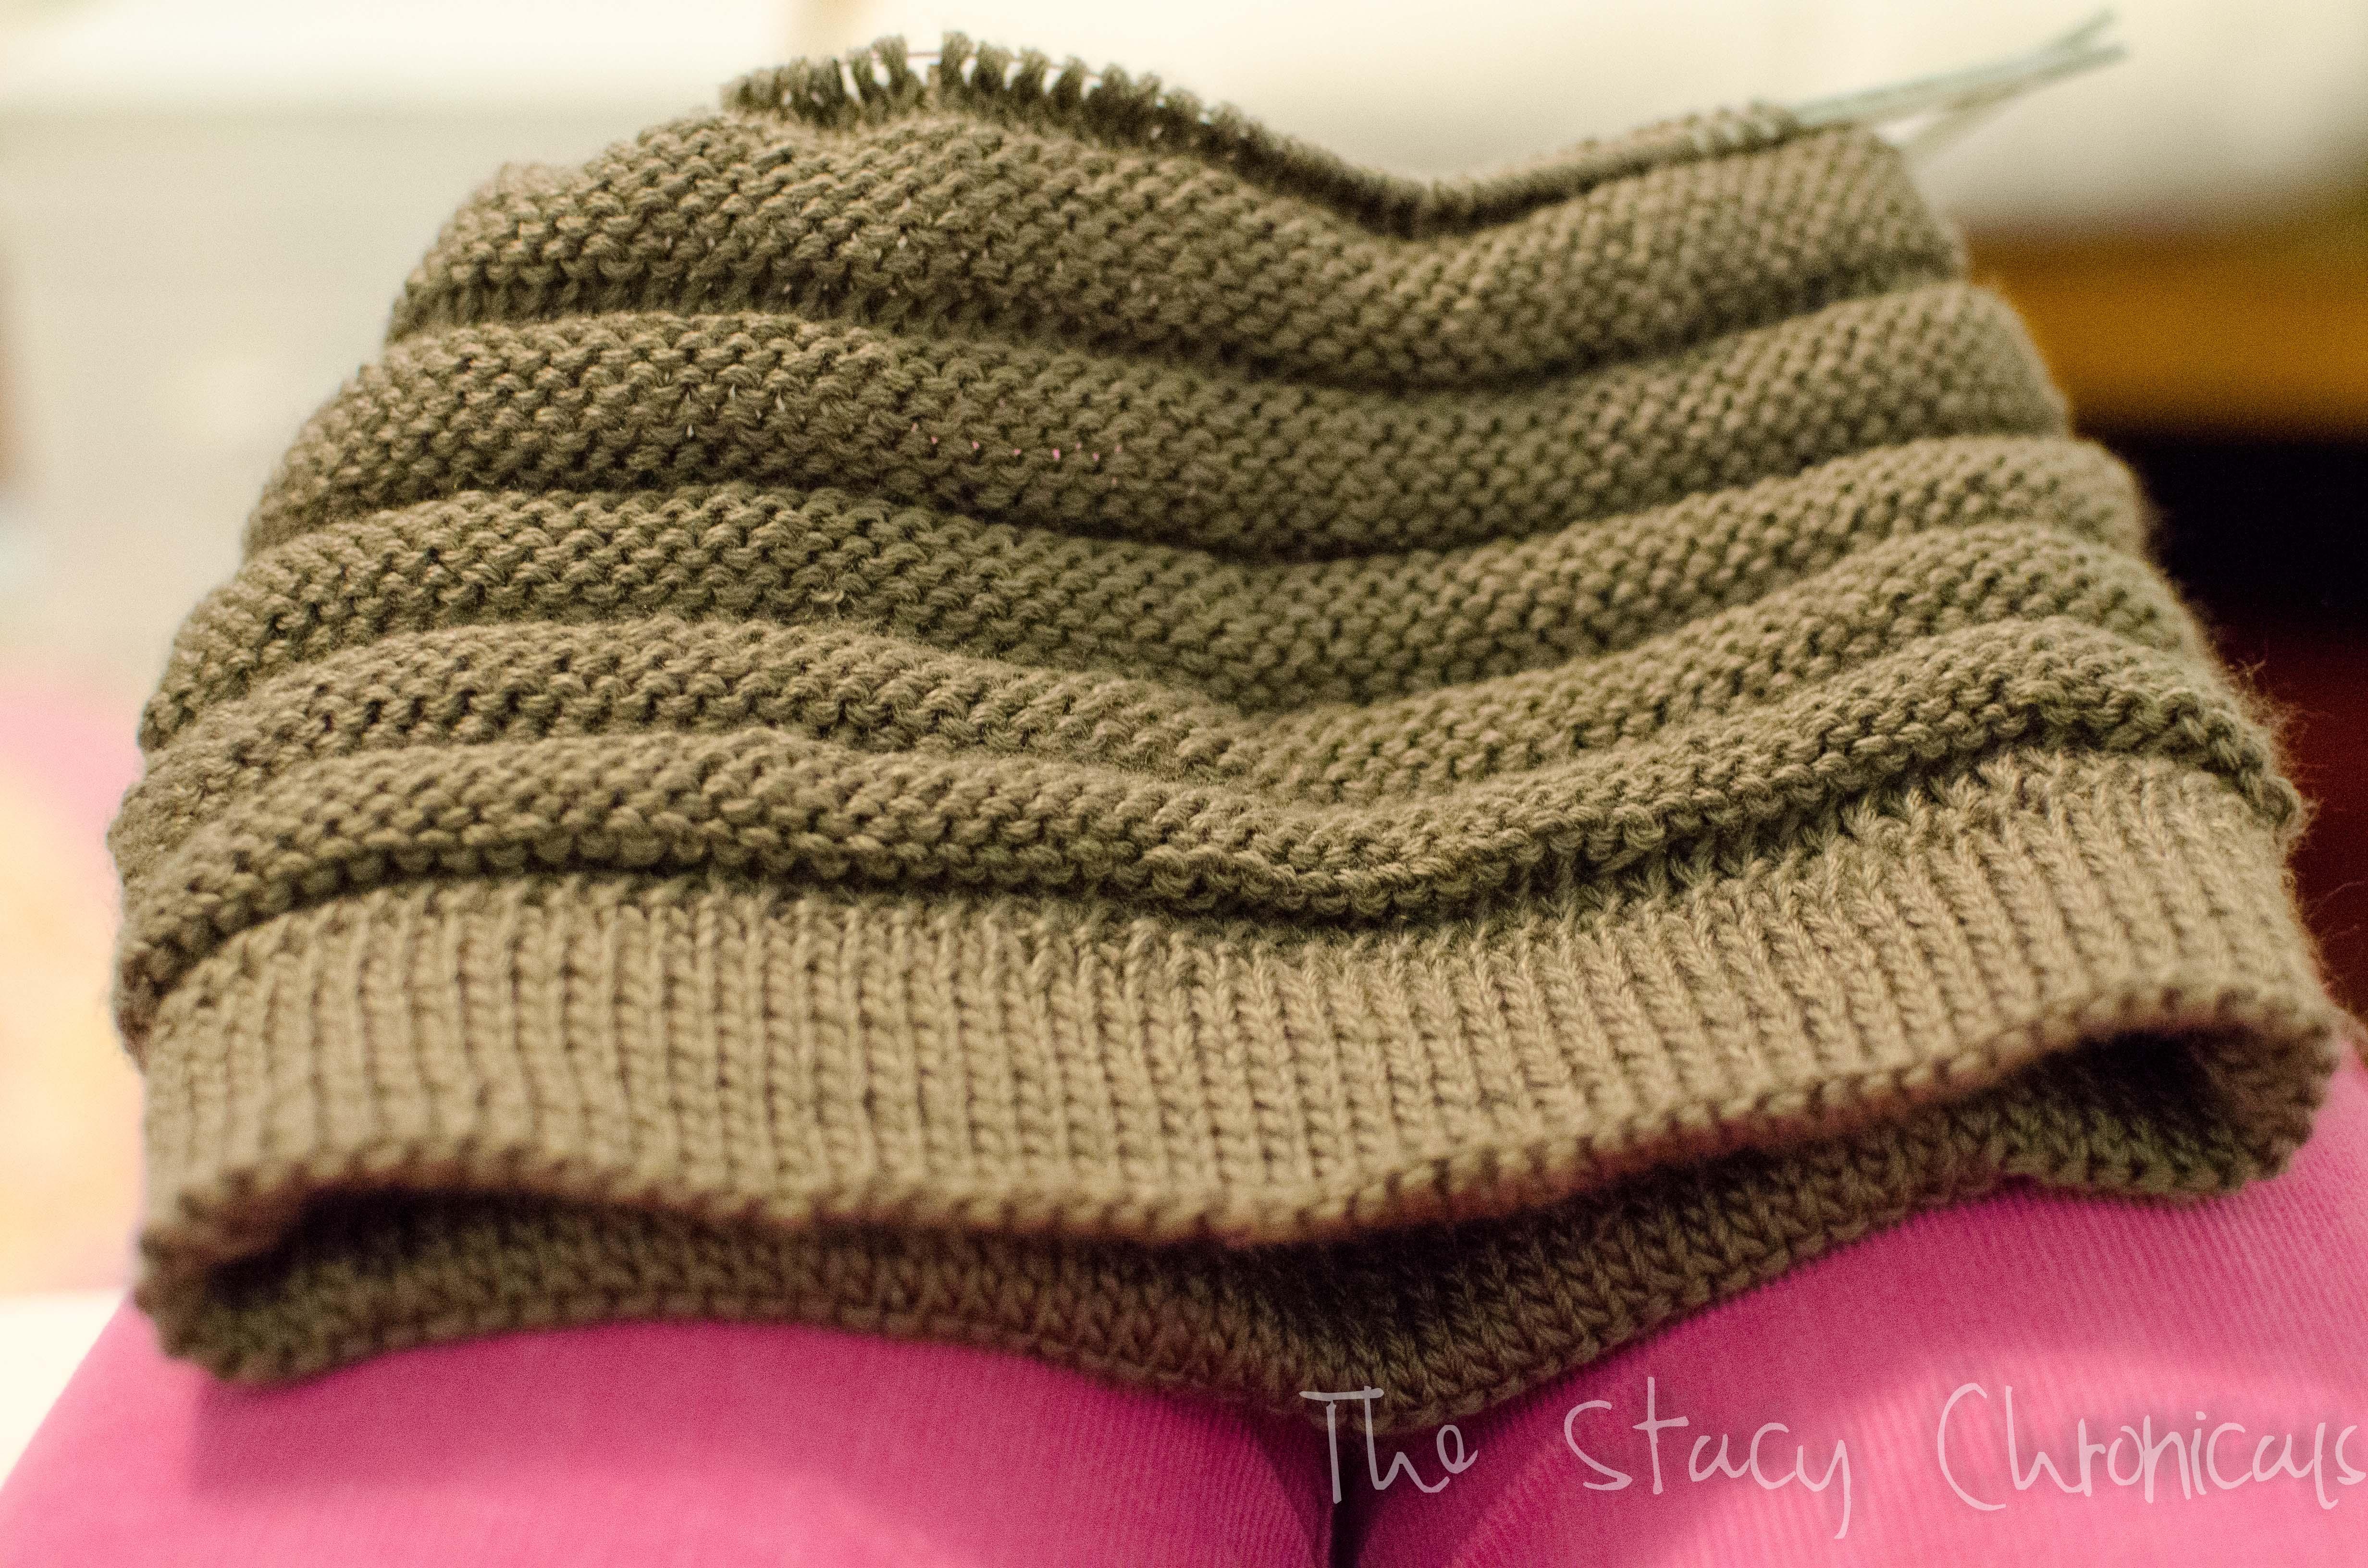 Magic Loop Knitting VS 16 inch Circular Needles The Stacy Chronicles